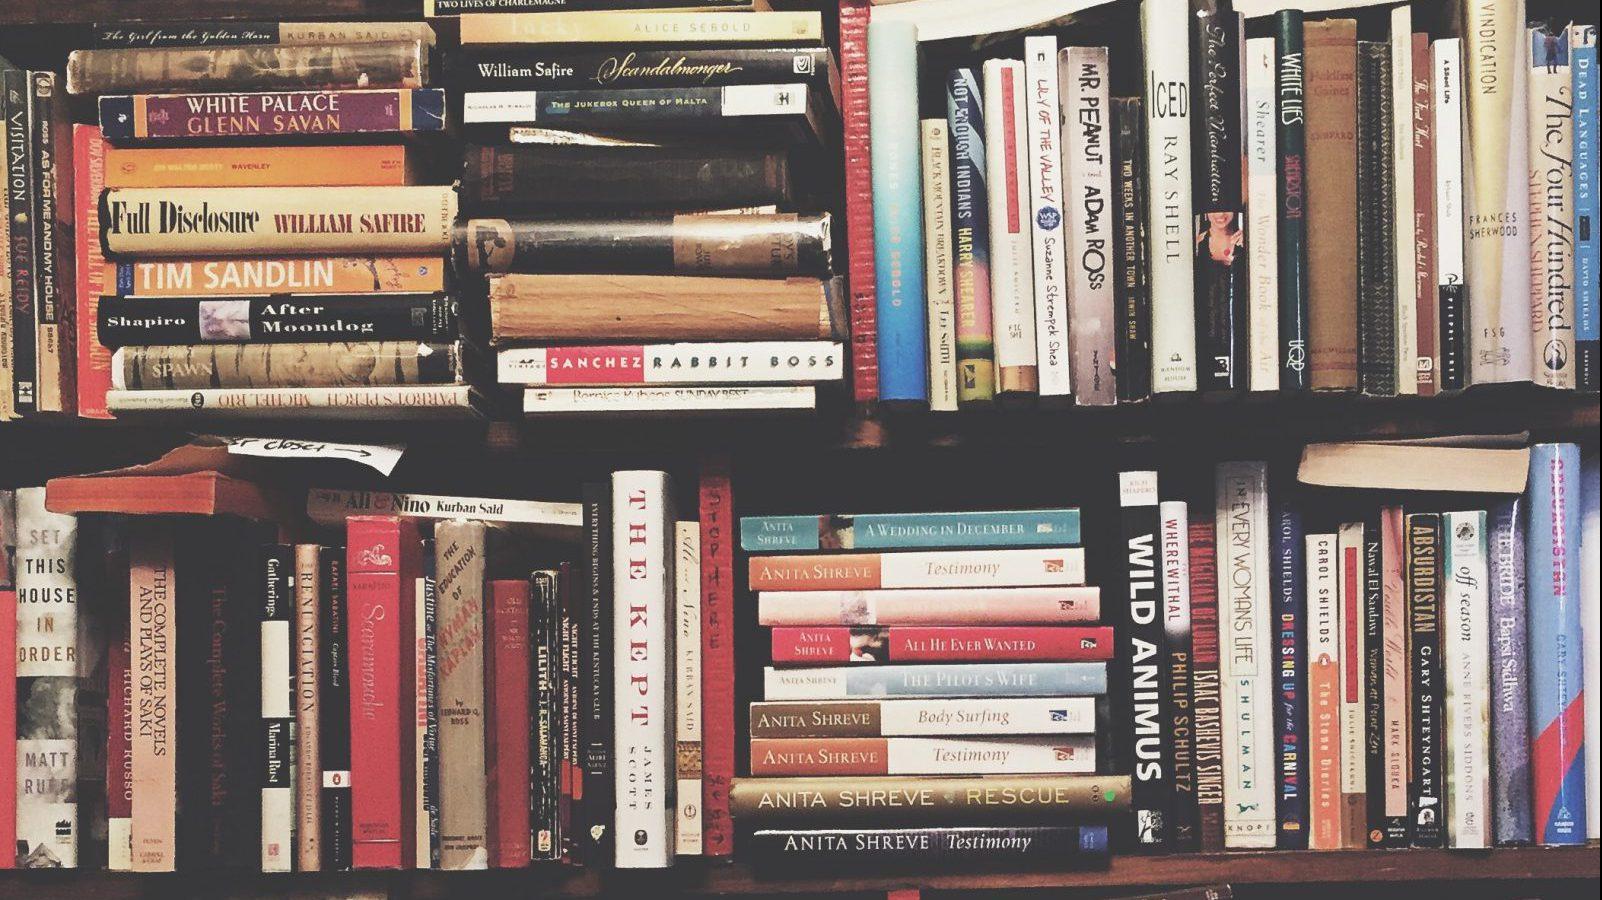 stacks of books on bookshelf